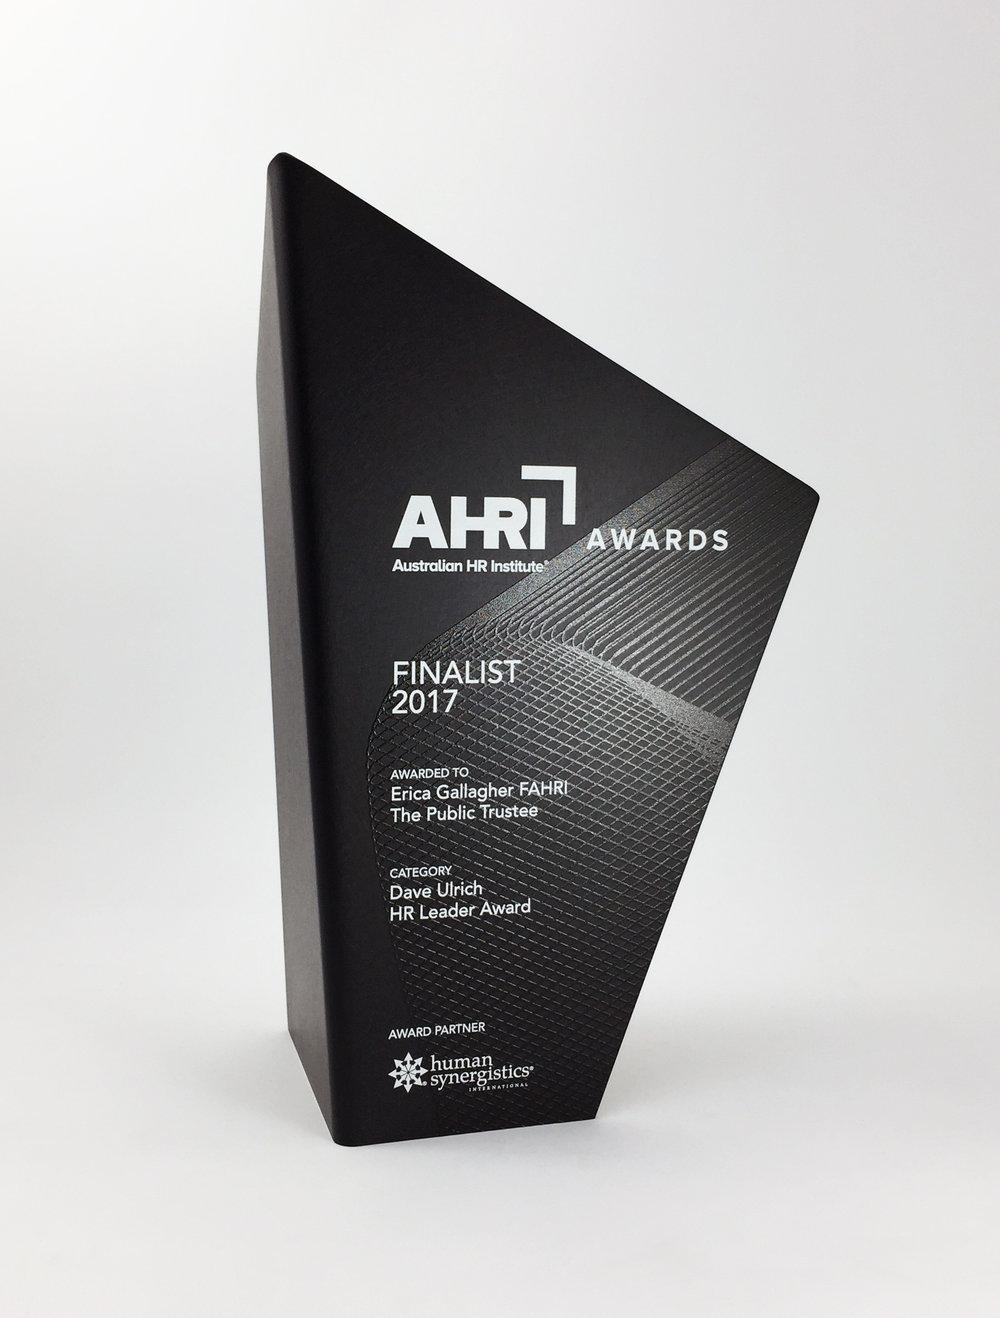 AHRI-aluminium-graphic-trophy-award-01.jpg